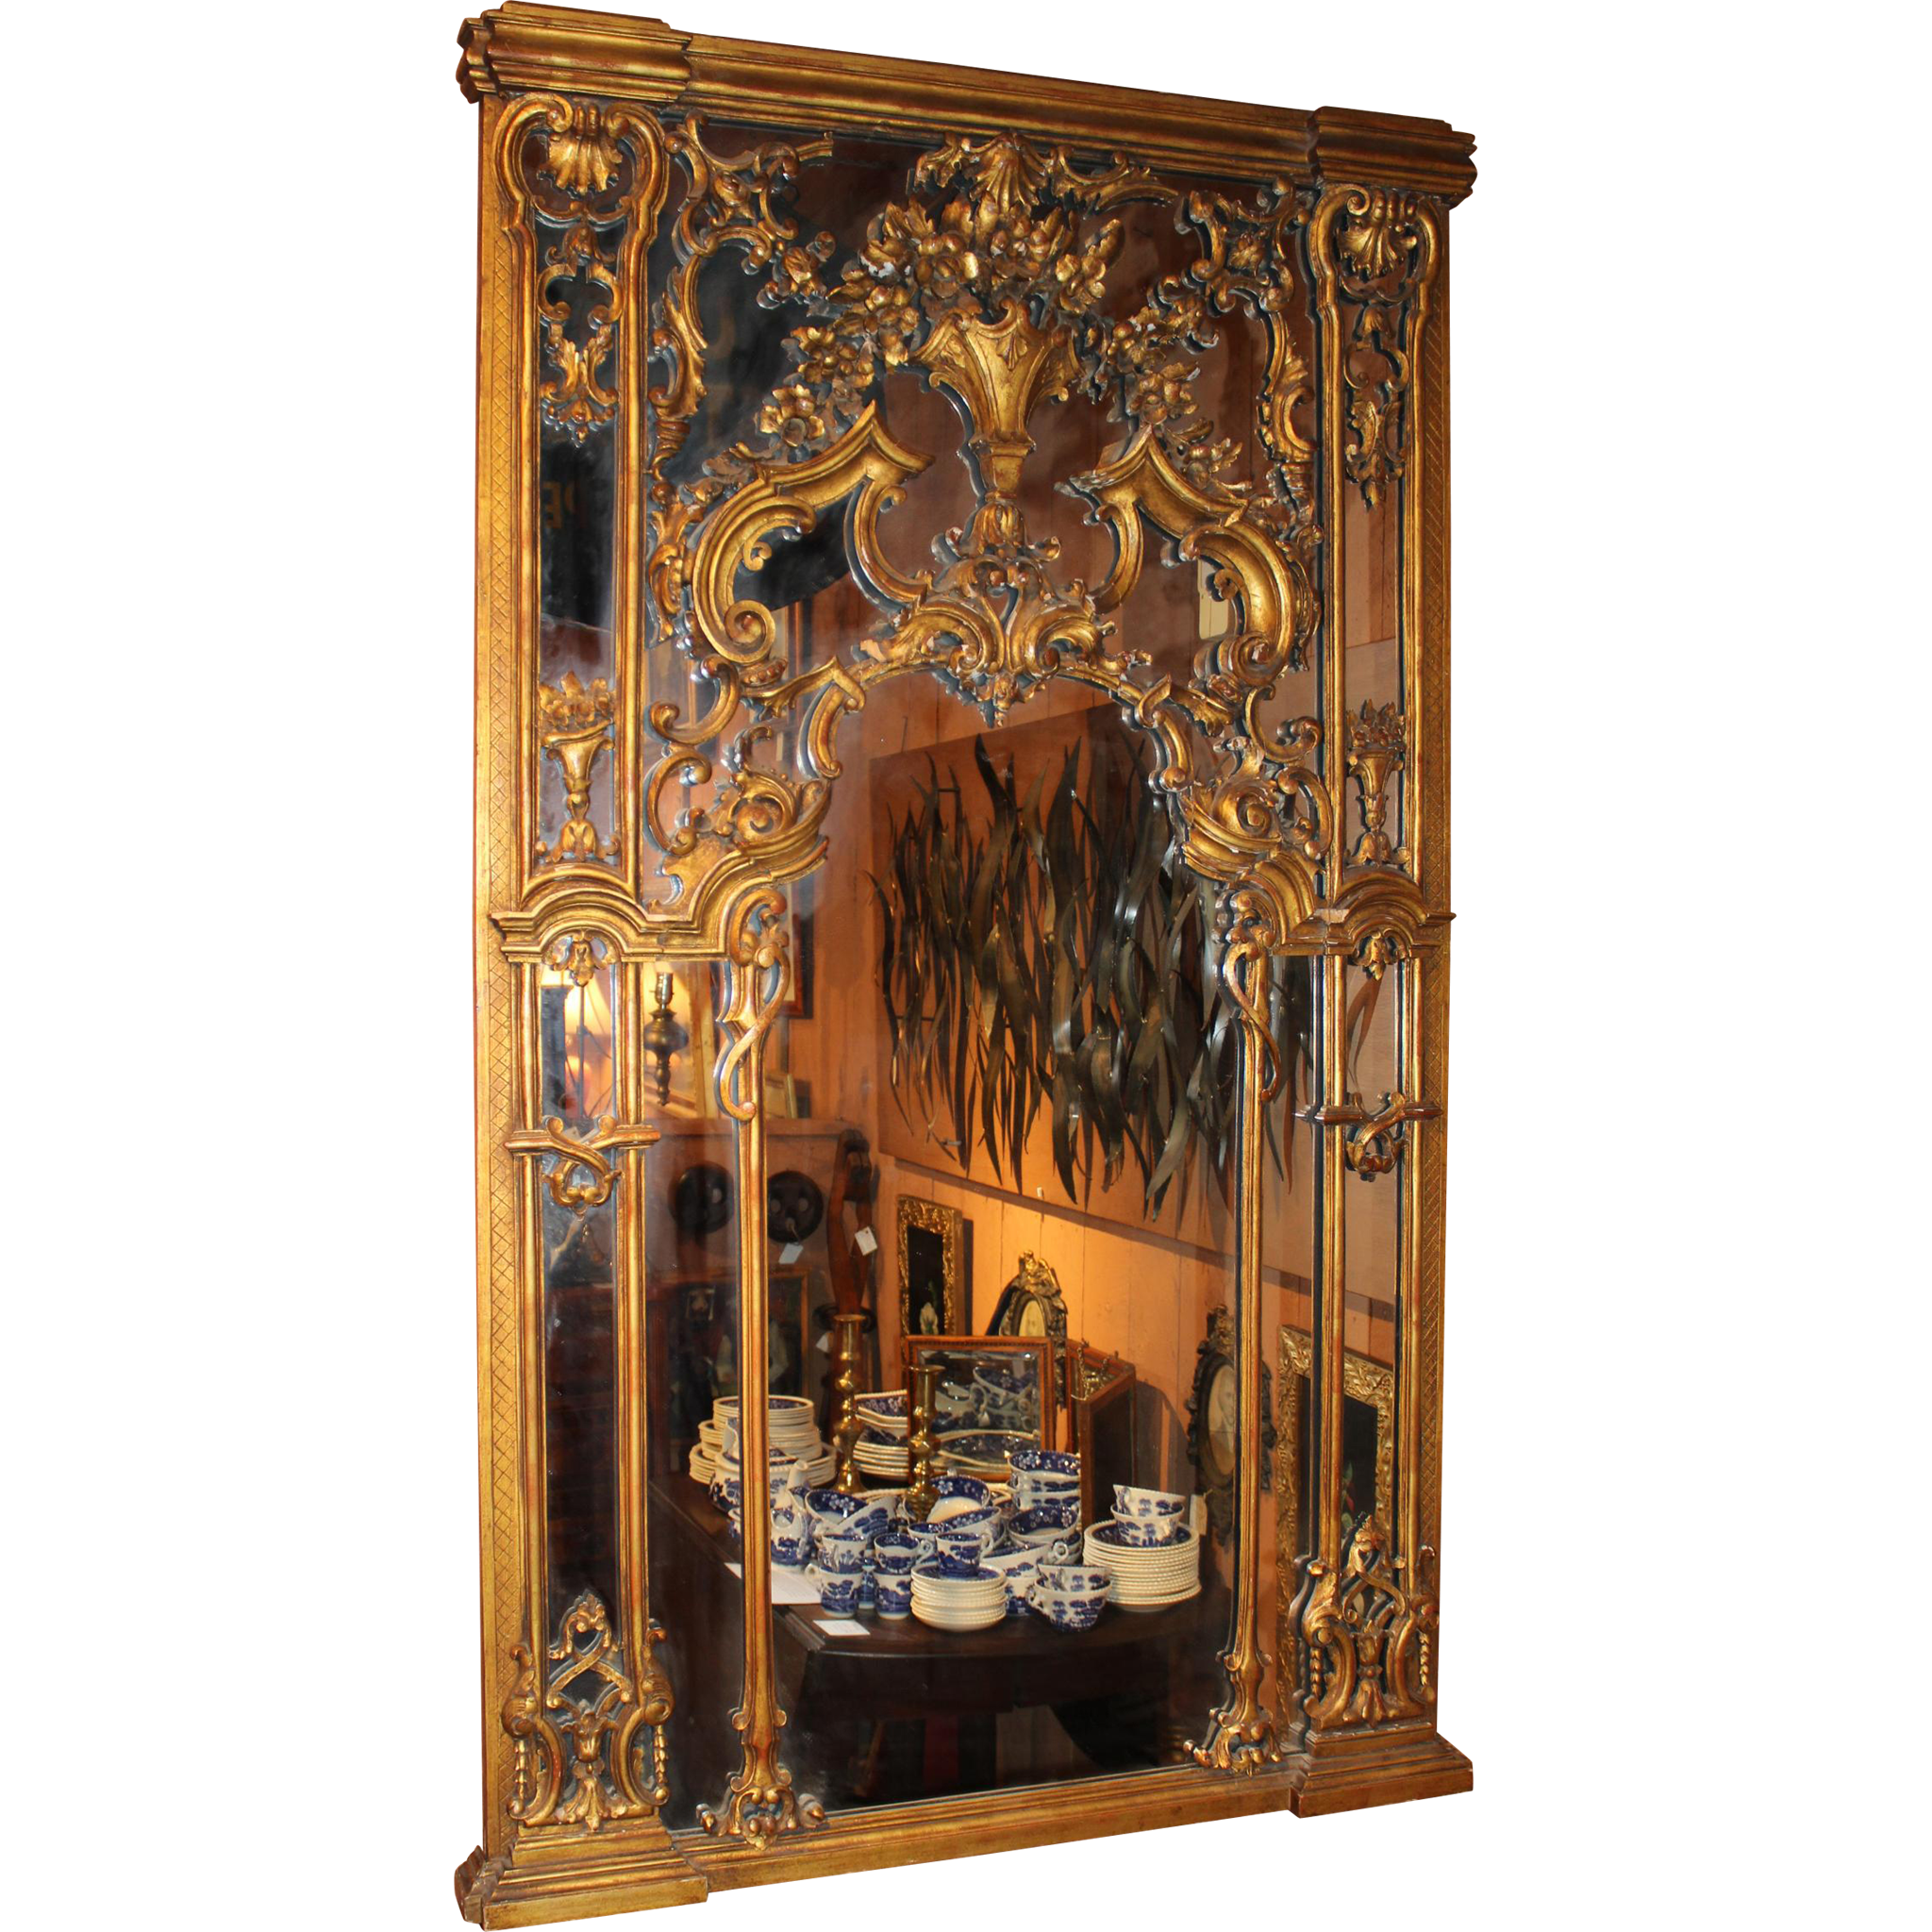 19th c Italian Carved Polychrome Gilt Wall Mirror